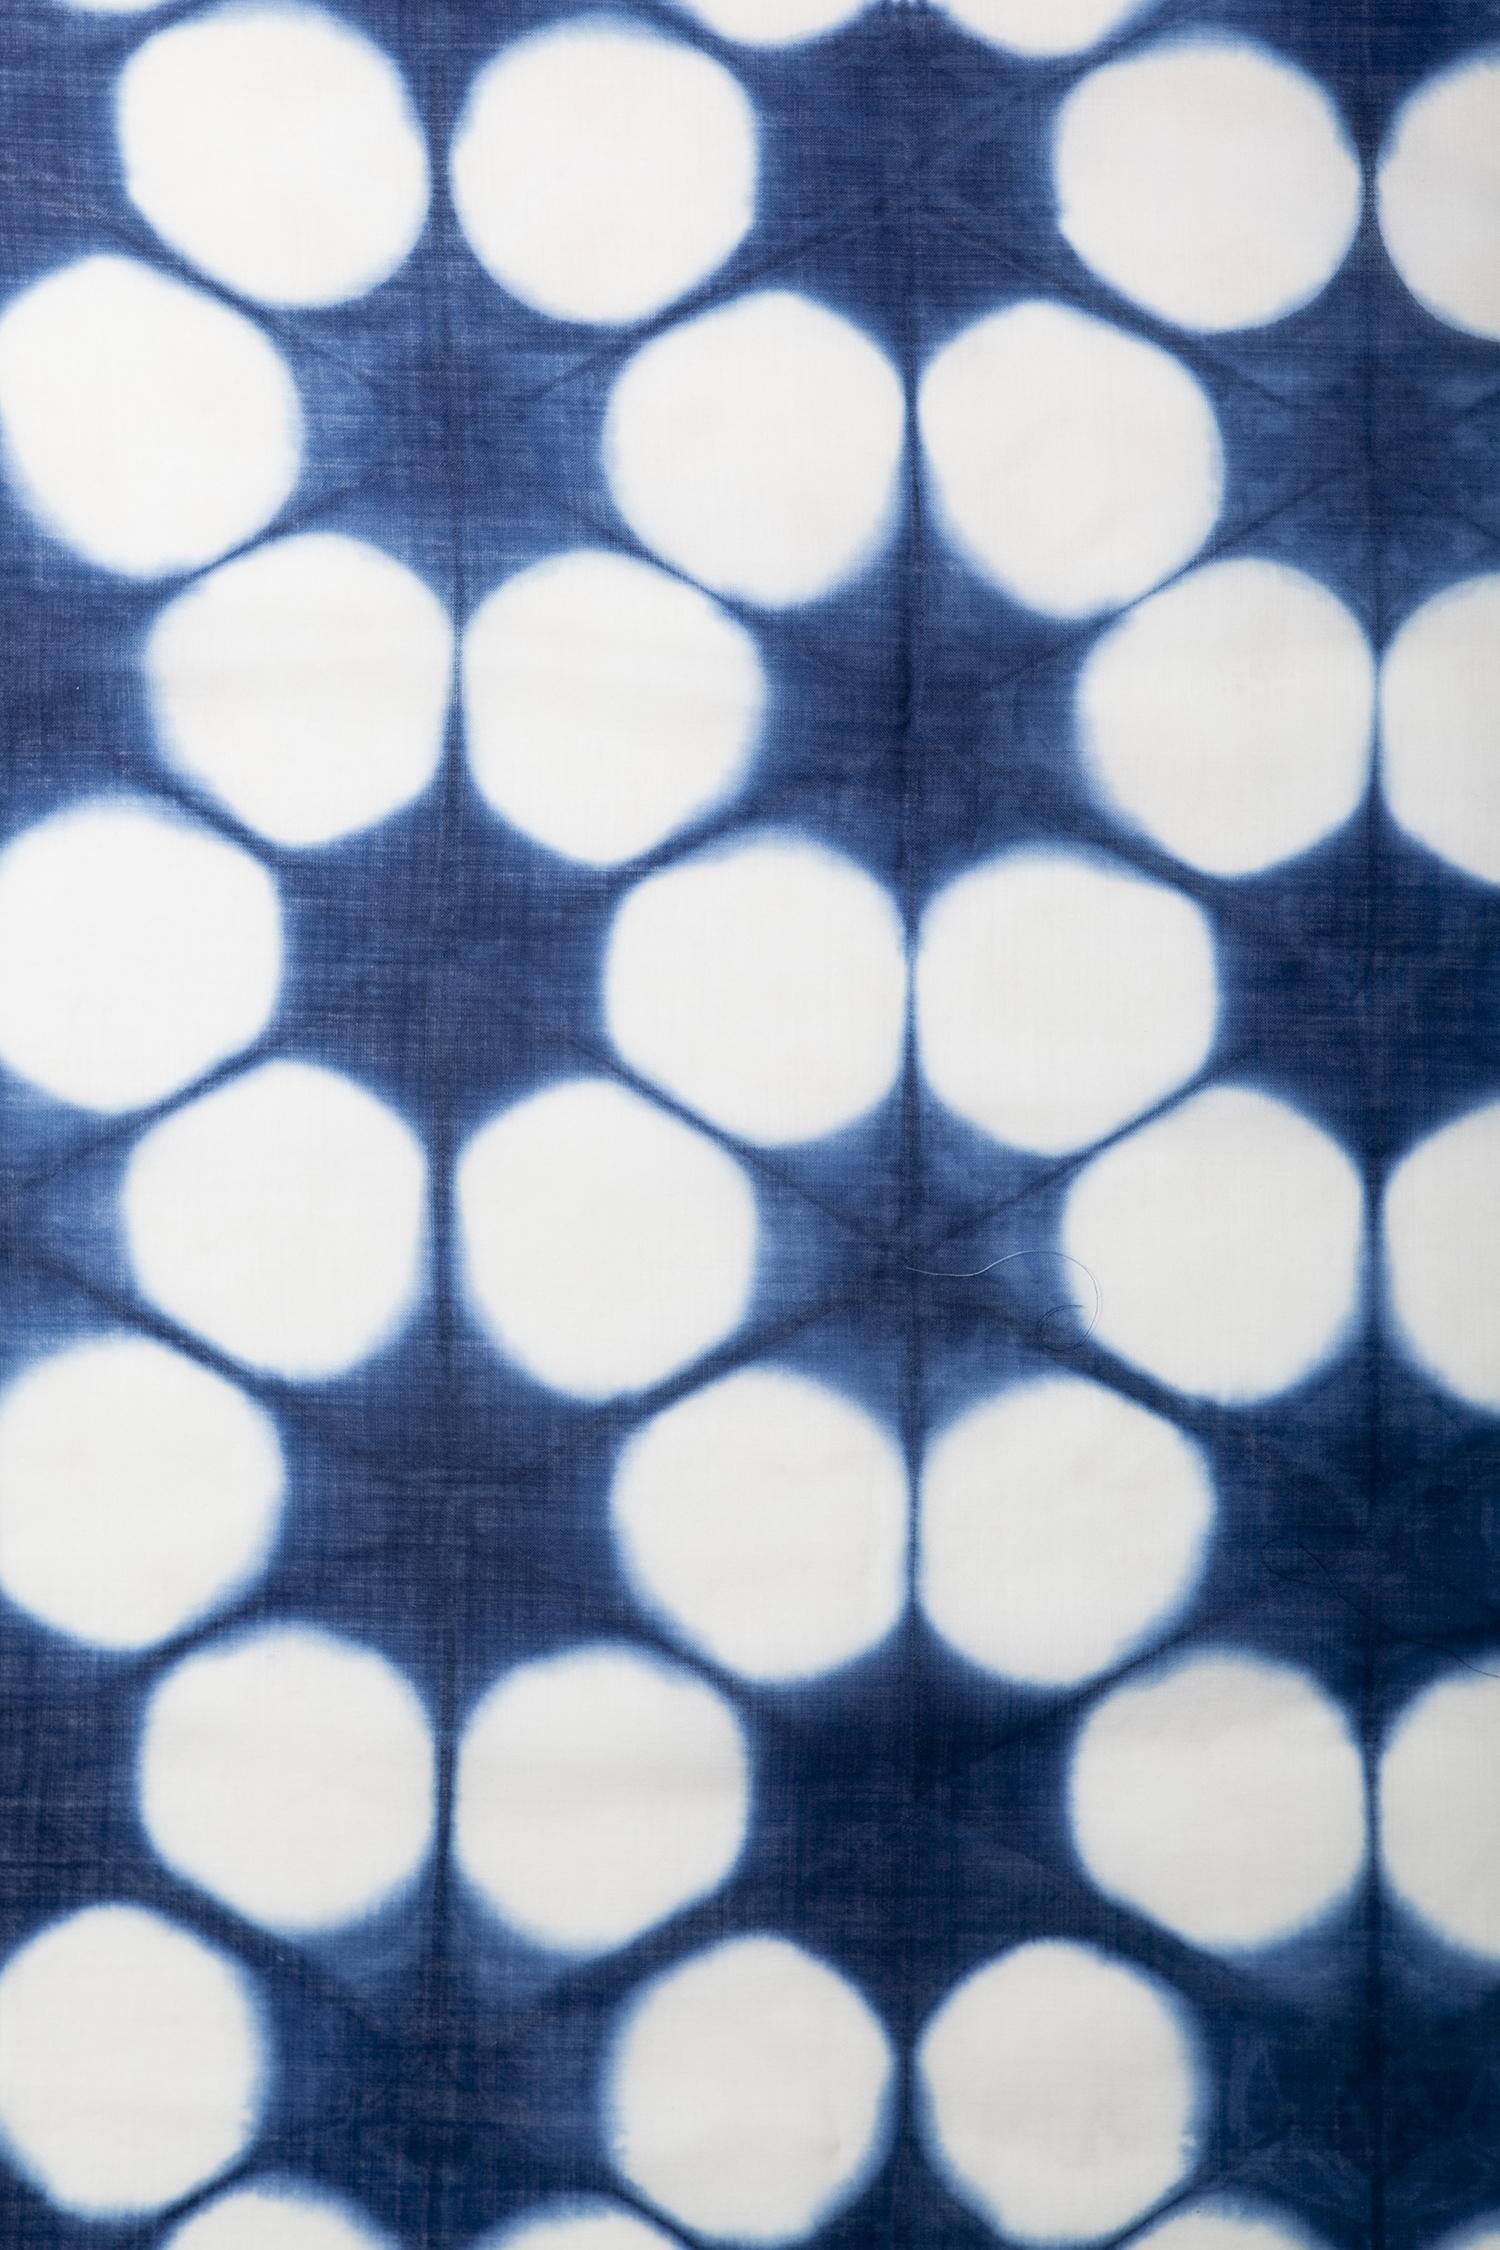 2a.WS scarf round detail copy